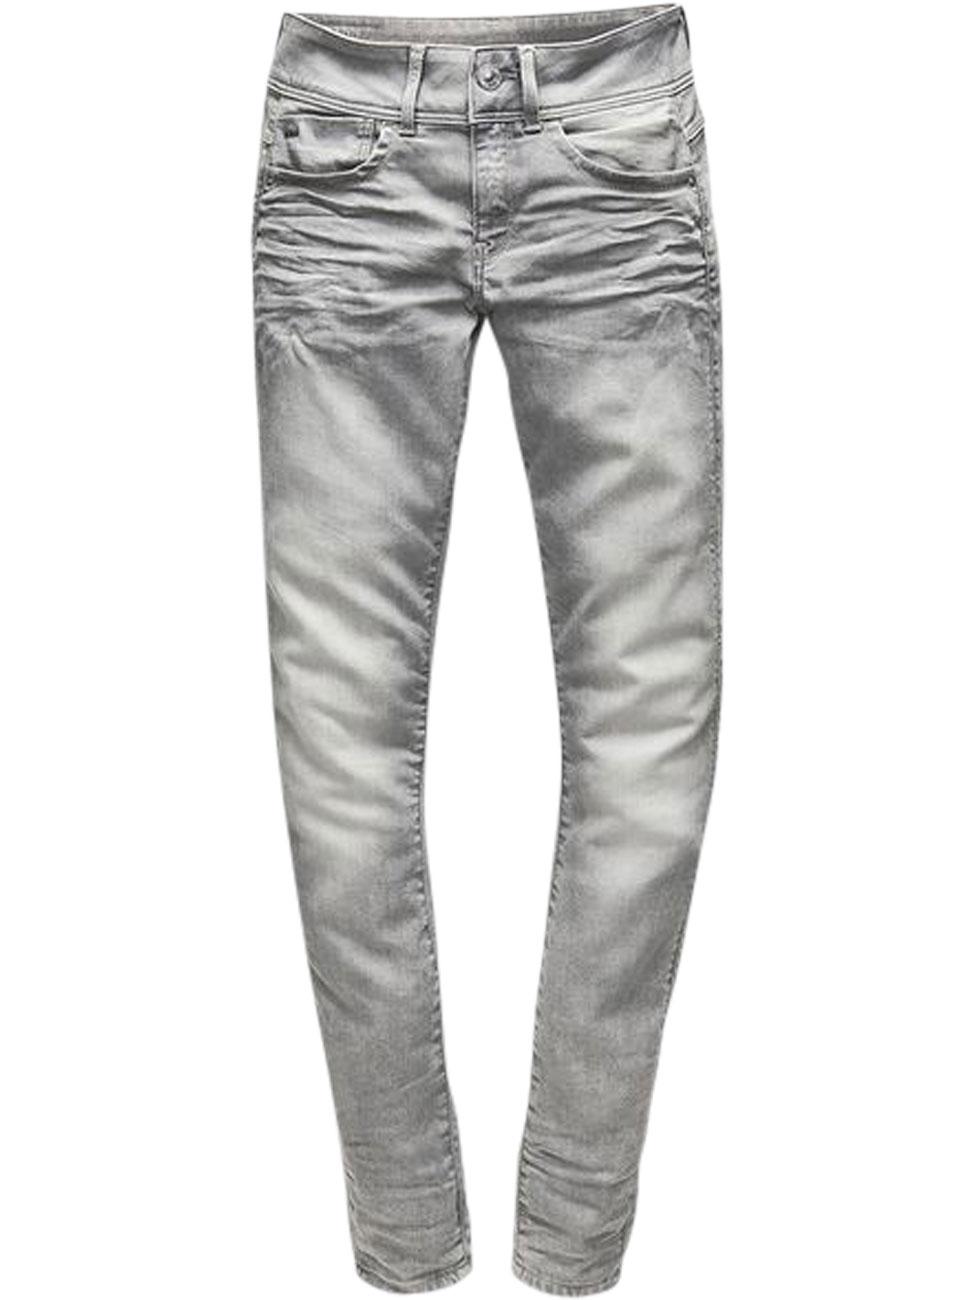 g star damen jeans lynn mid waist skinny fit grau. Black Bedroom Furniture Sets. Home Design Ideas